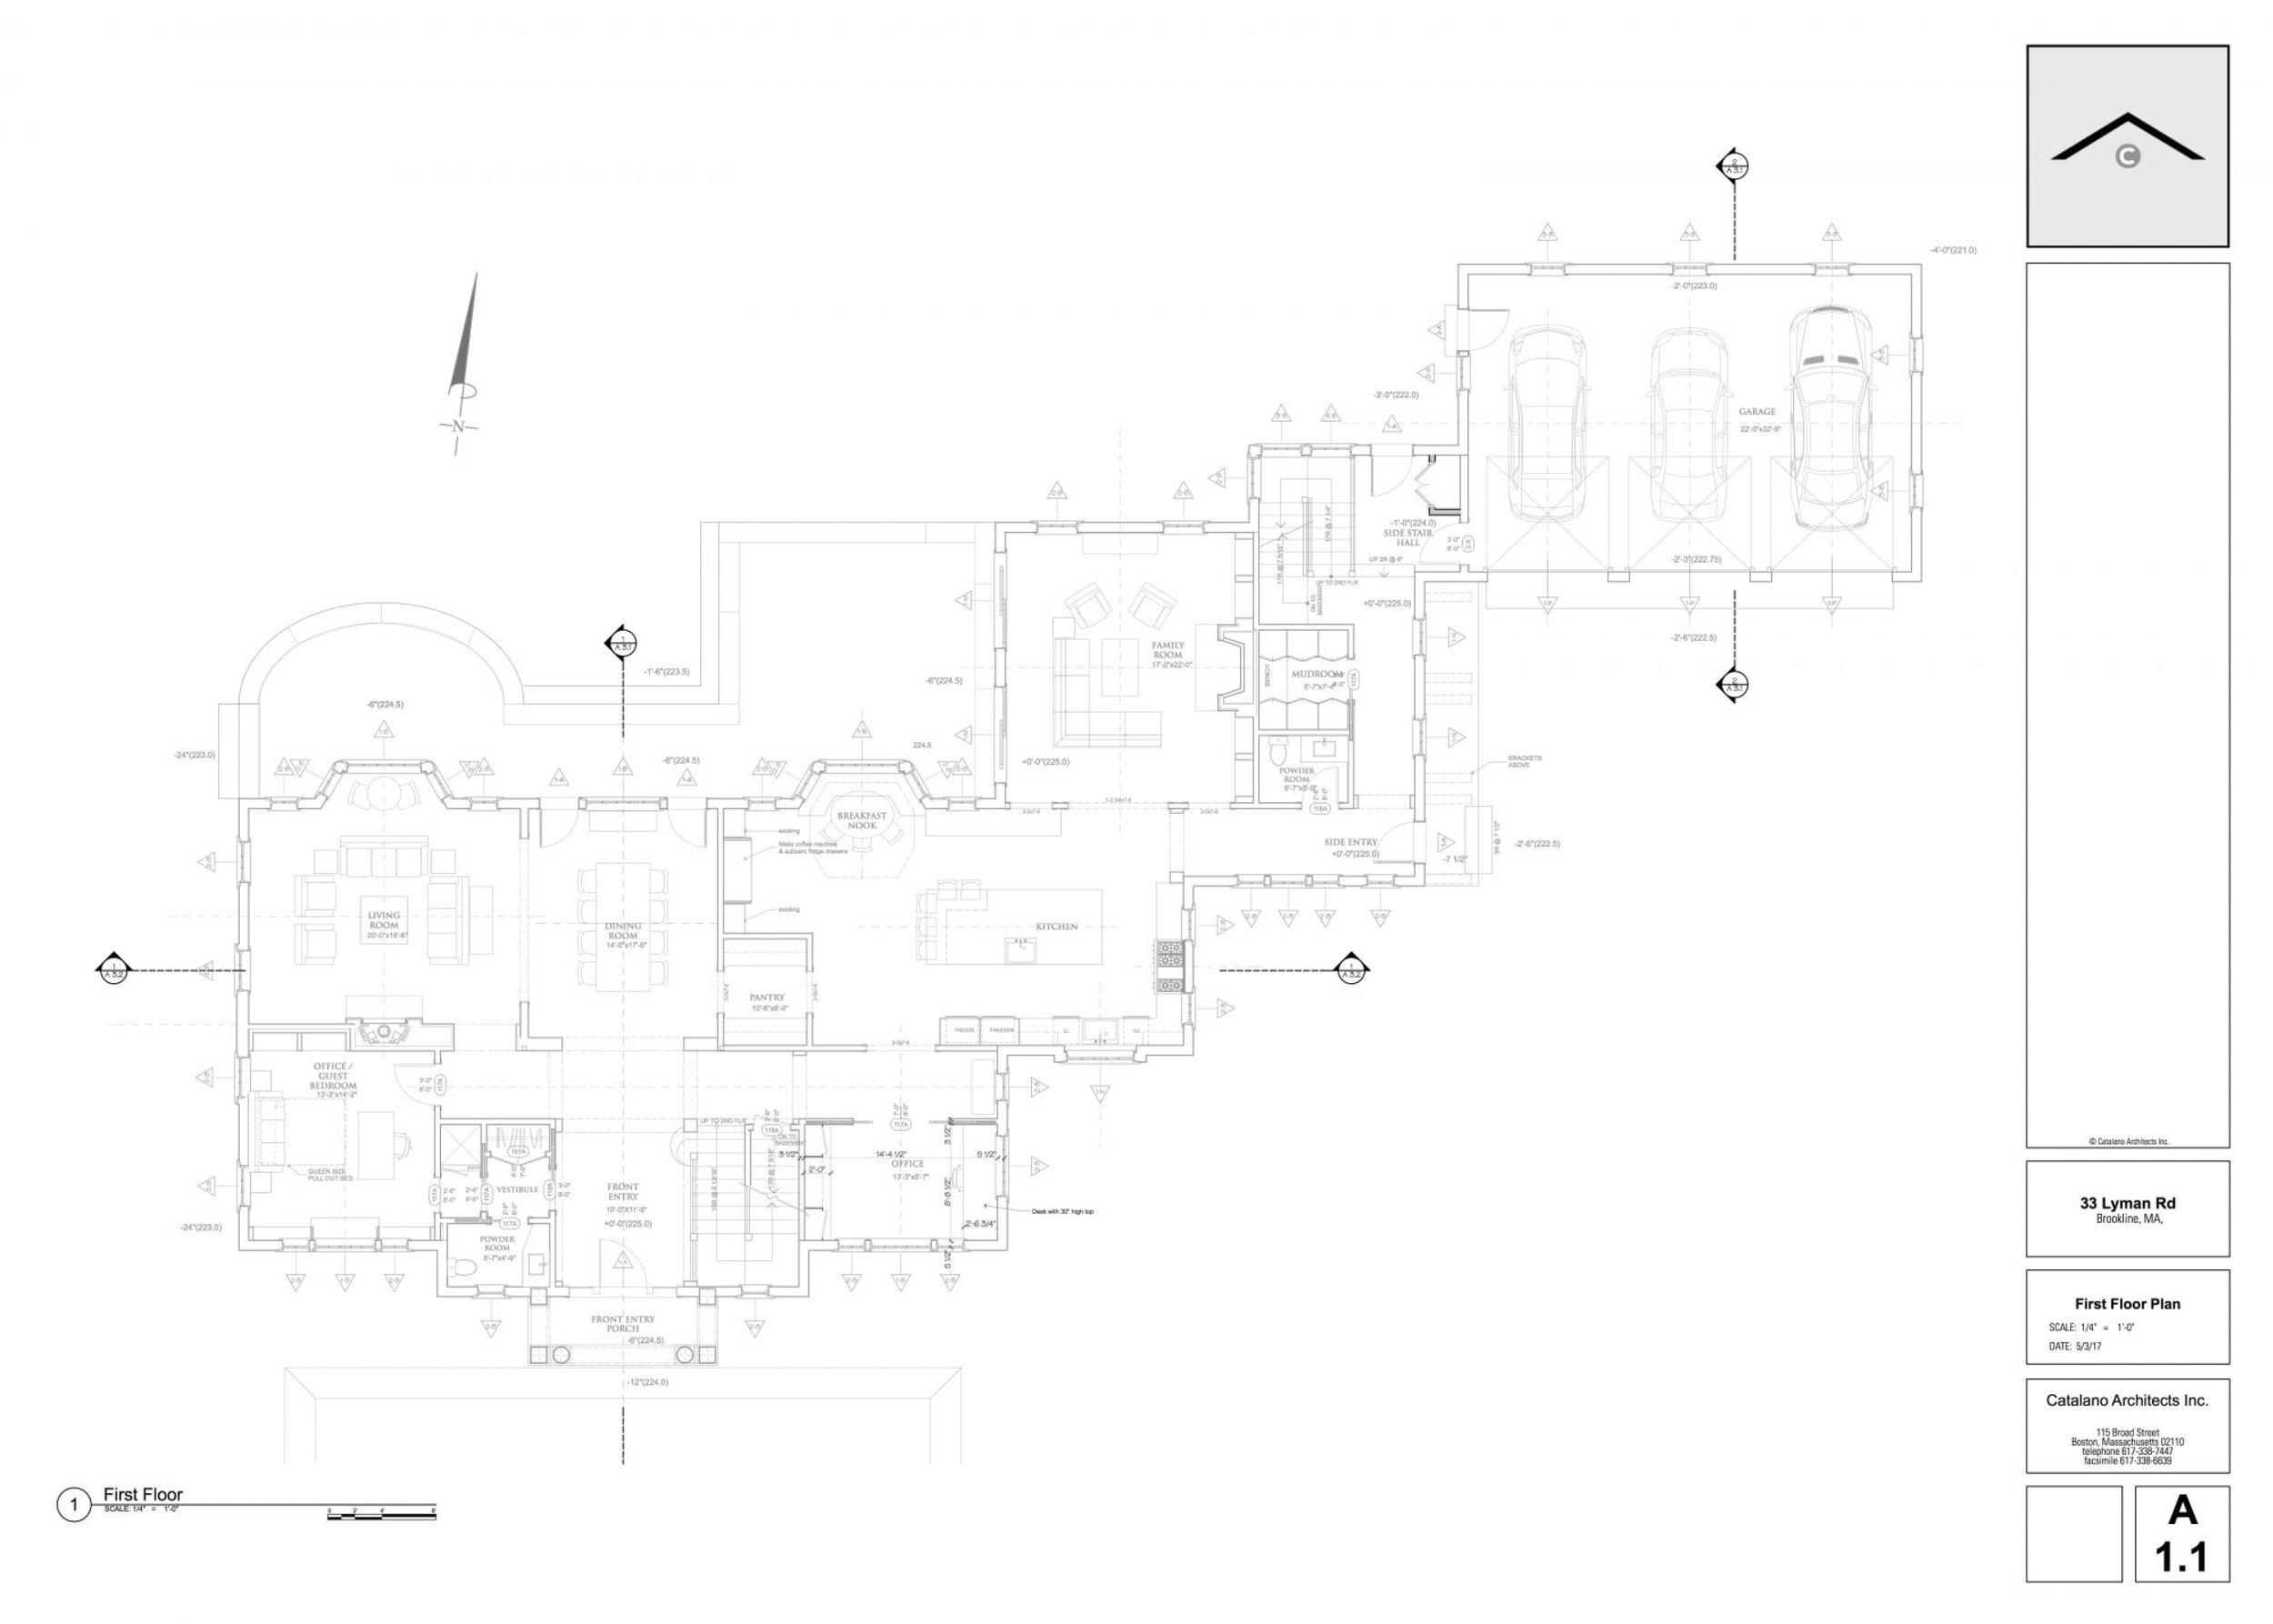 Floor Plans — 33 Lyman Road